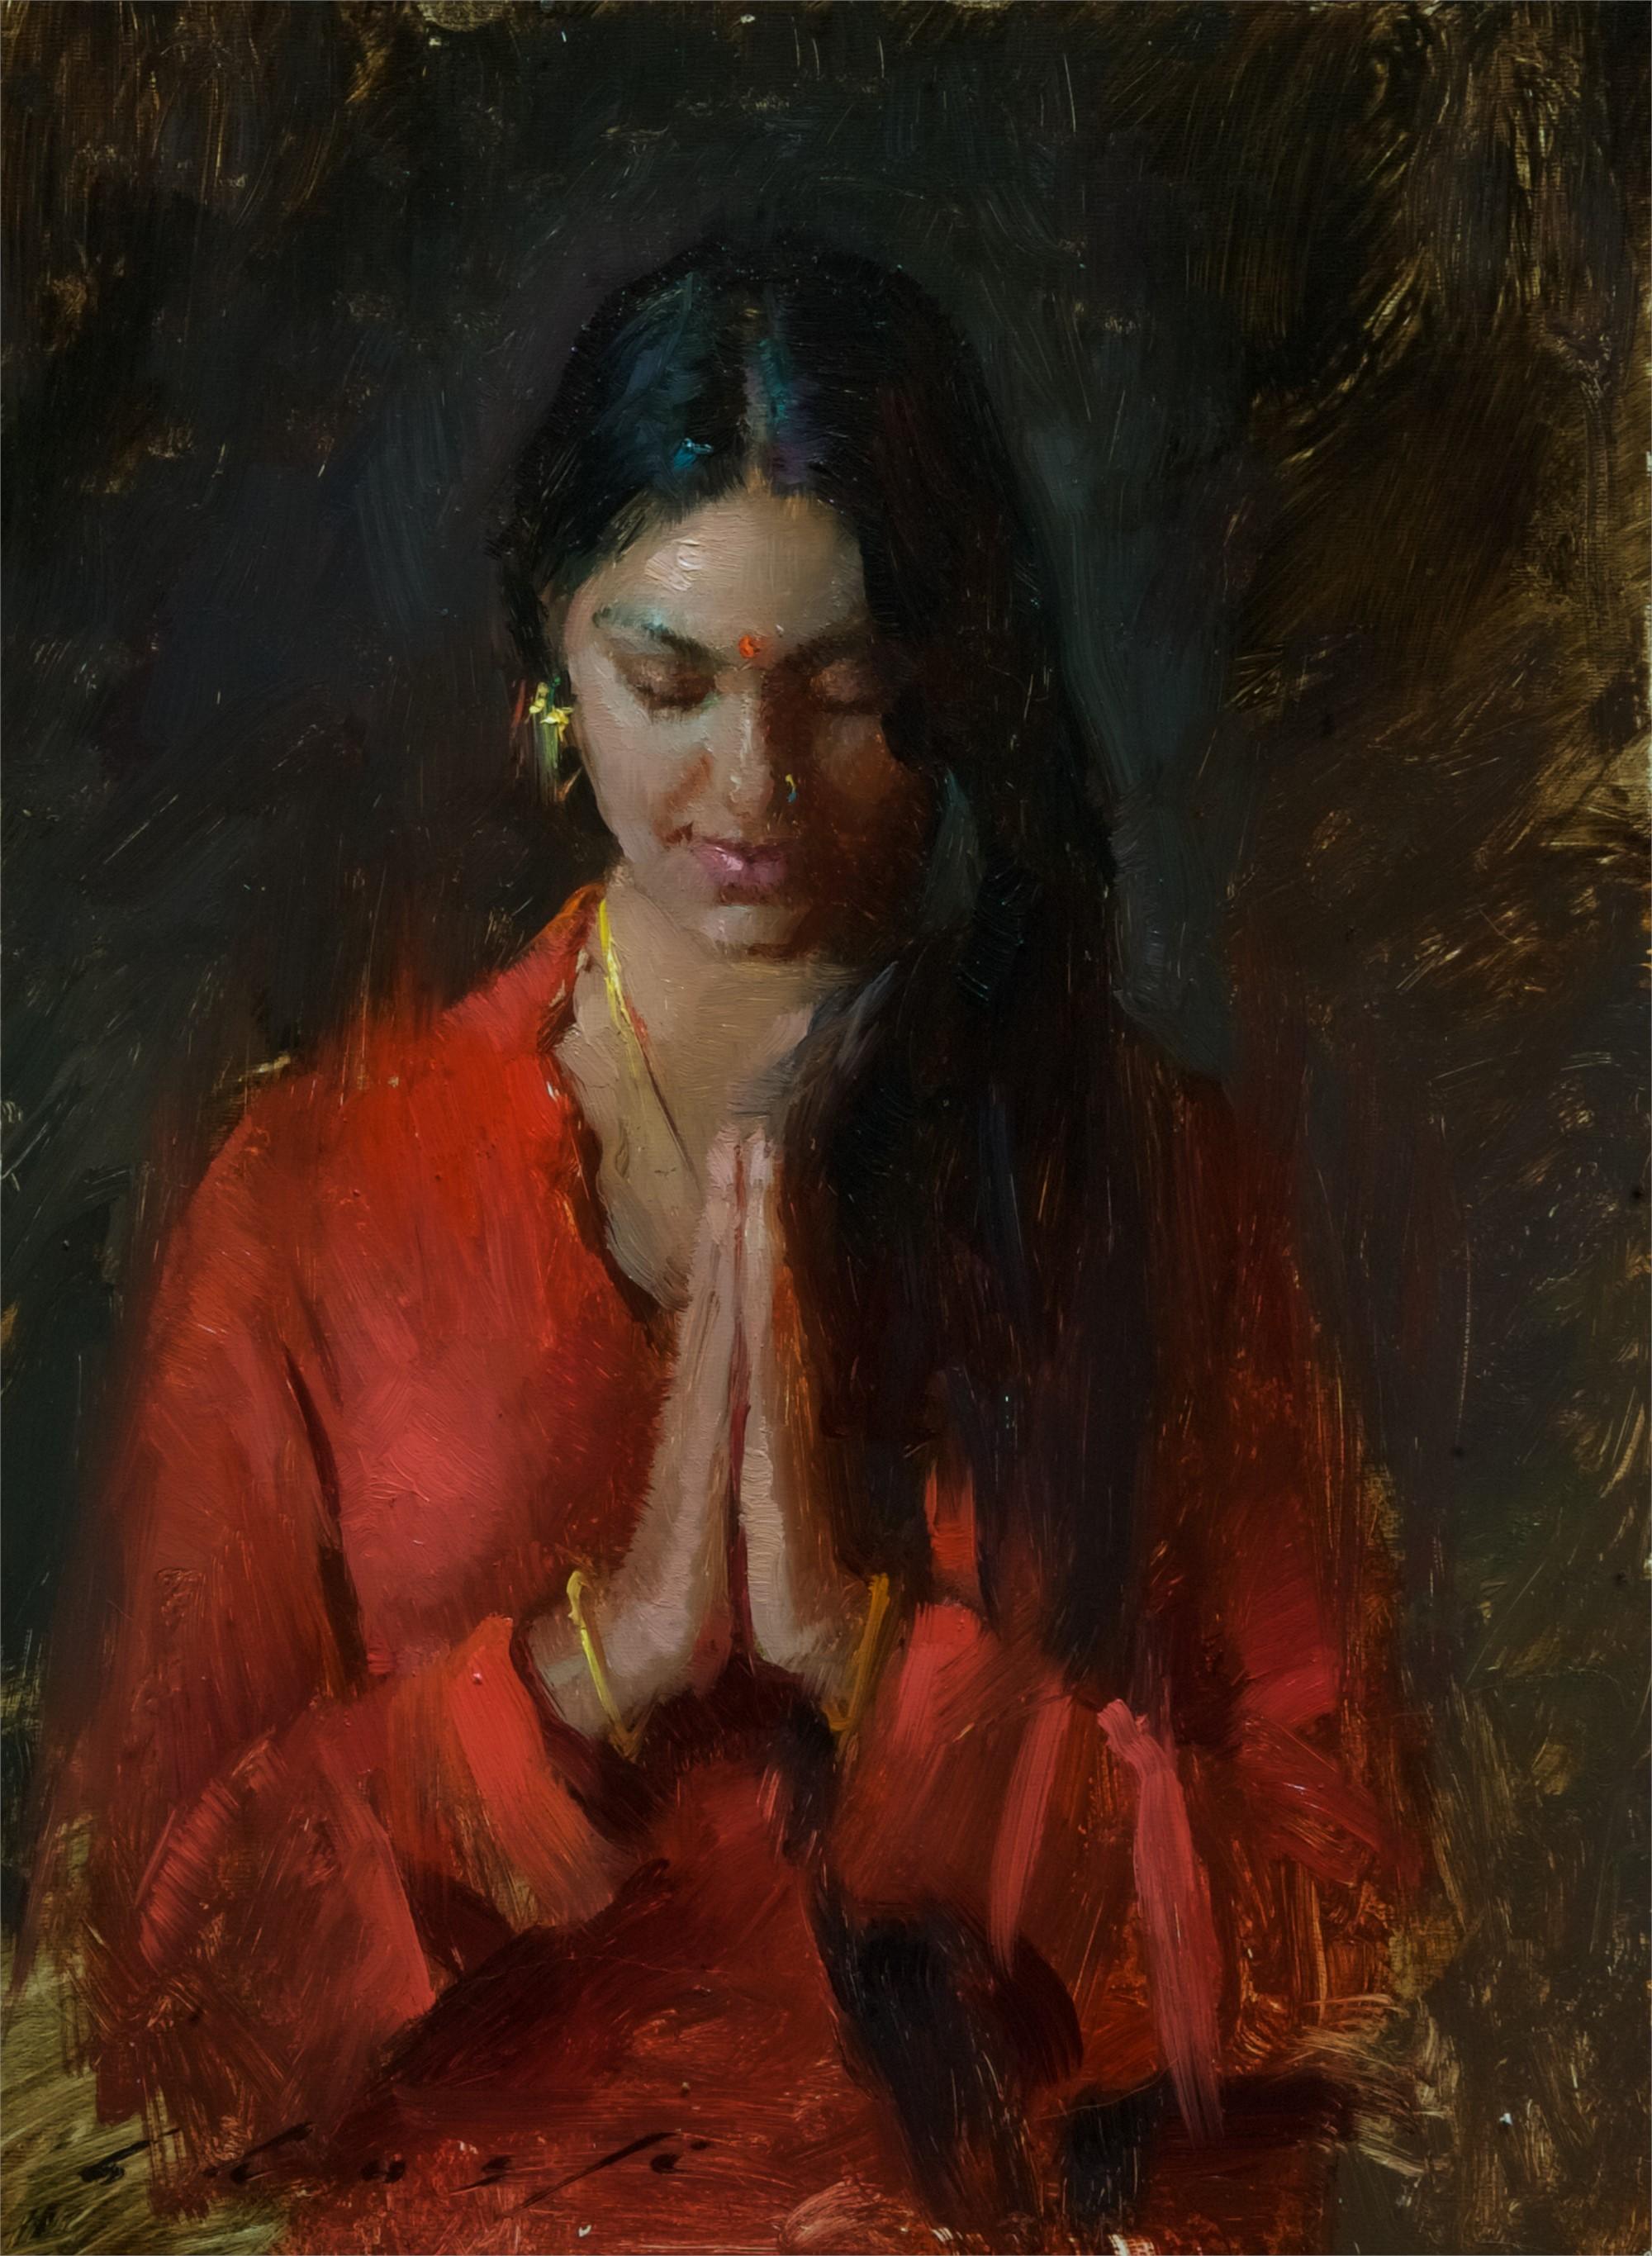 Ommm... by Suchitra Bhosle